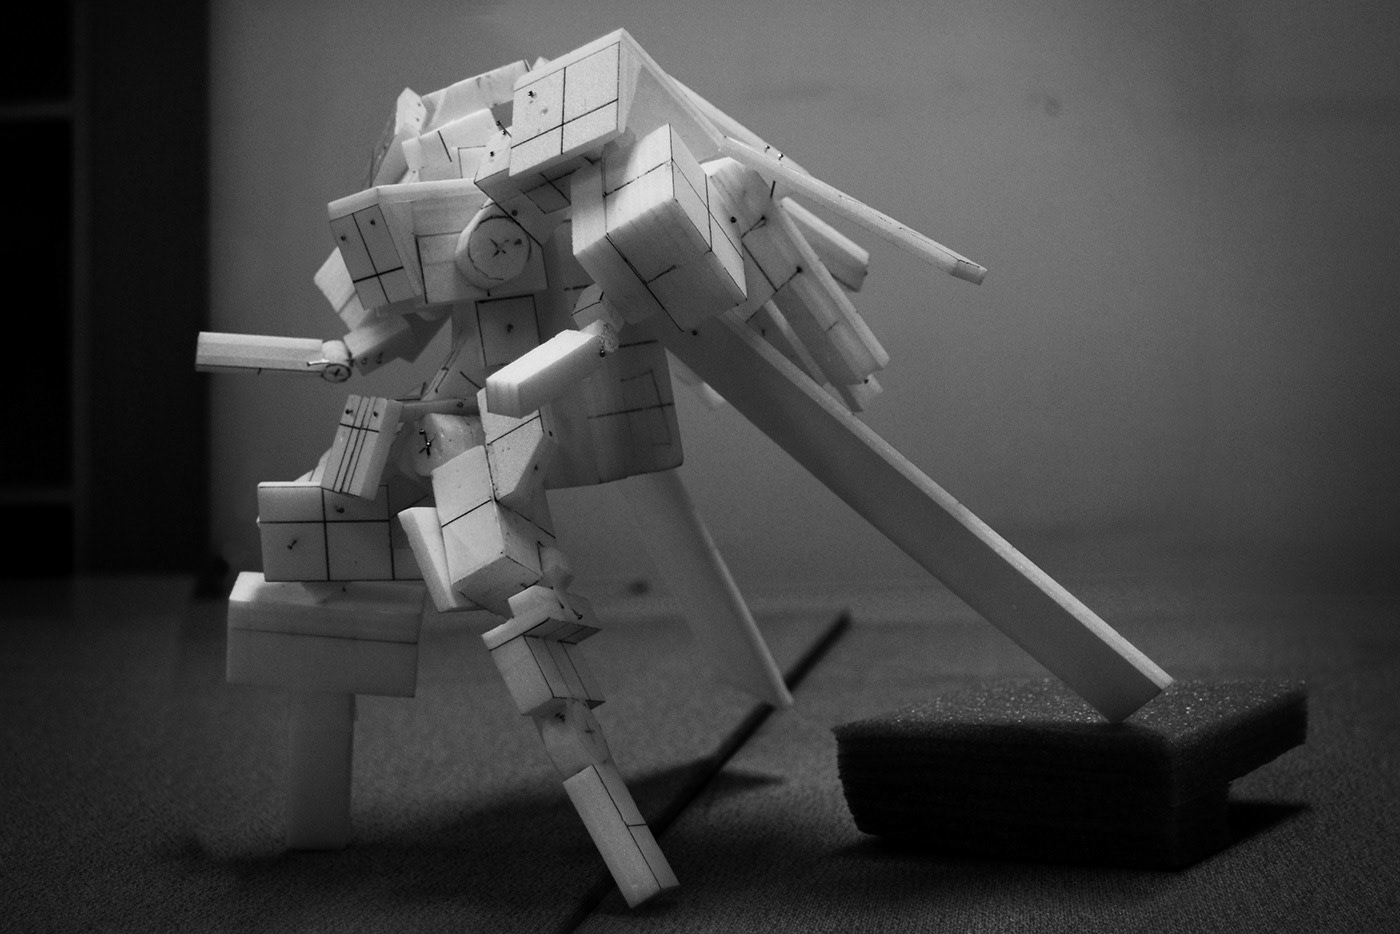 Korea robot transform Advertising  Character design  concept design craft Cyberpunk sci-fi SF